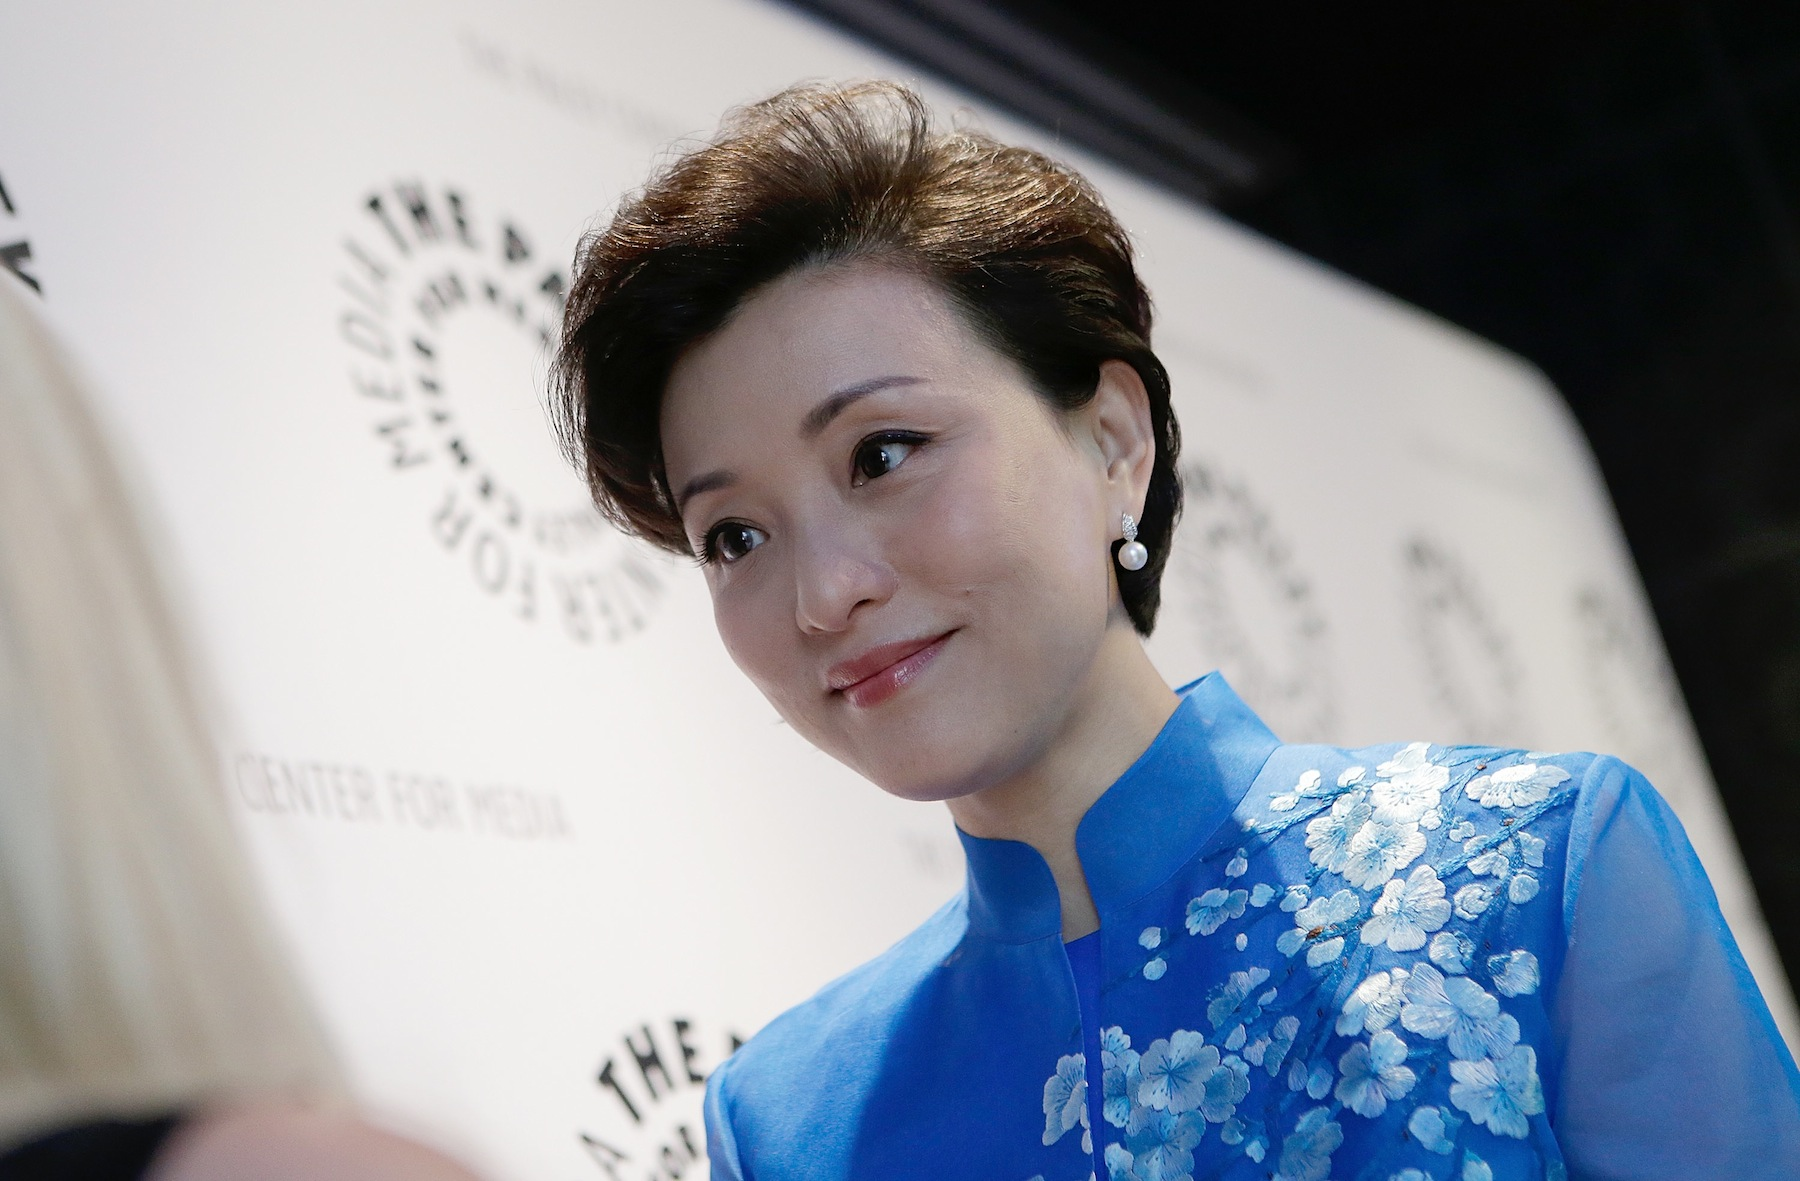 Yang Lan at a benefit on May 15, 2013, in New York City.